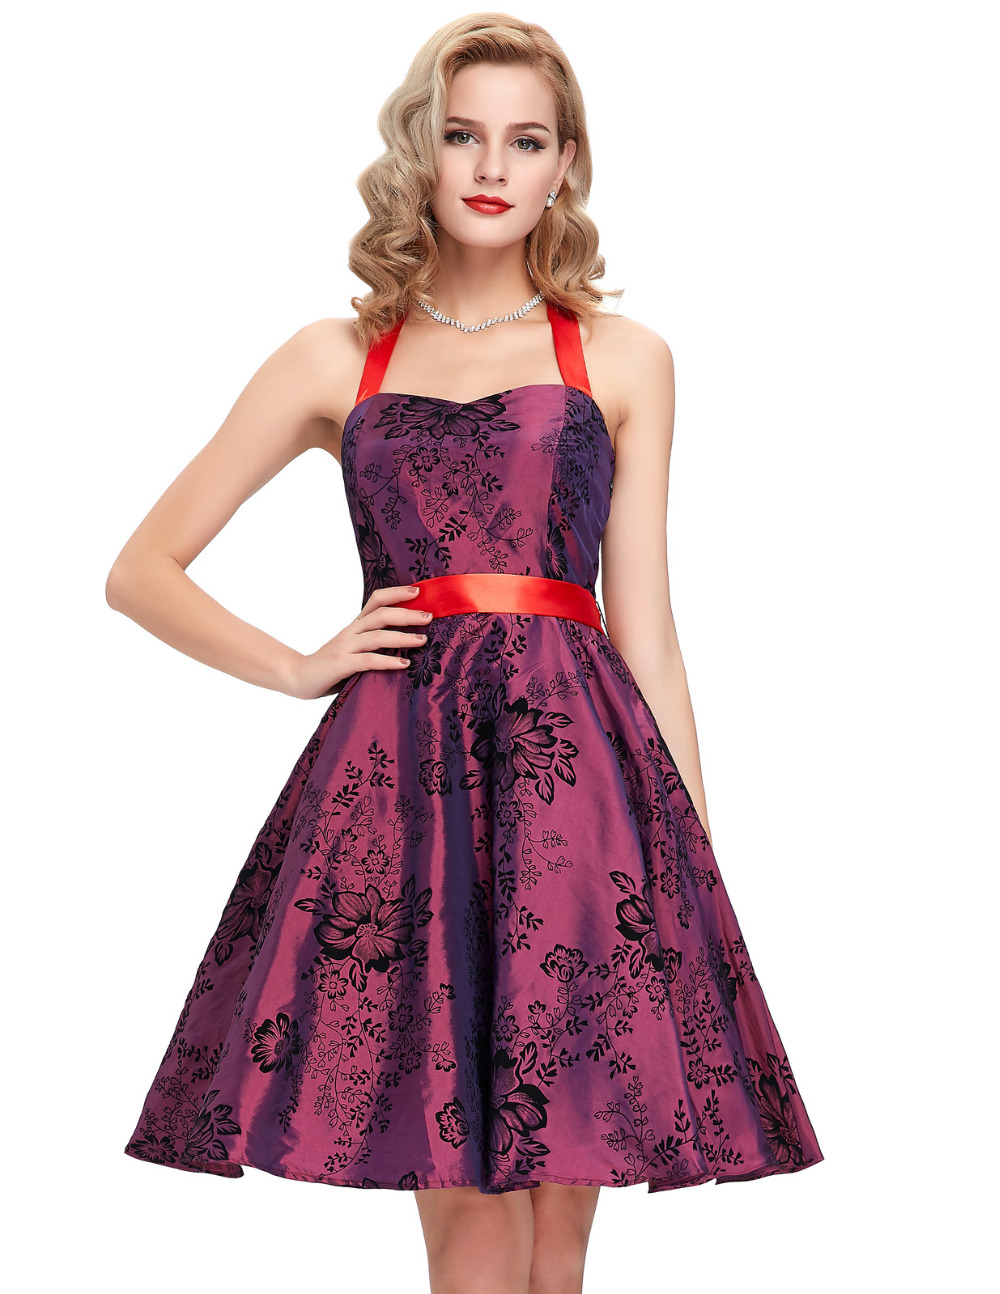 robe vintage dresses 40s 50s 60s rockabilly dress 2016 summer style halter printed housewife. Black Bedroom Furniture Sets. Home Design Ideas